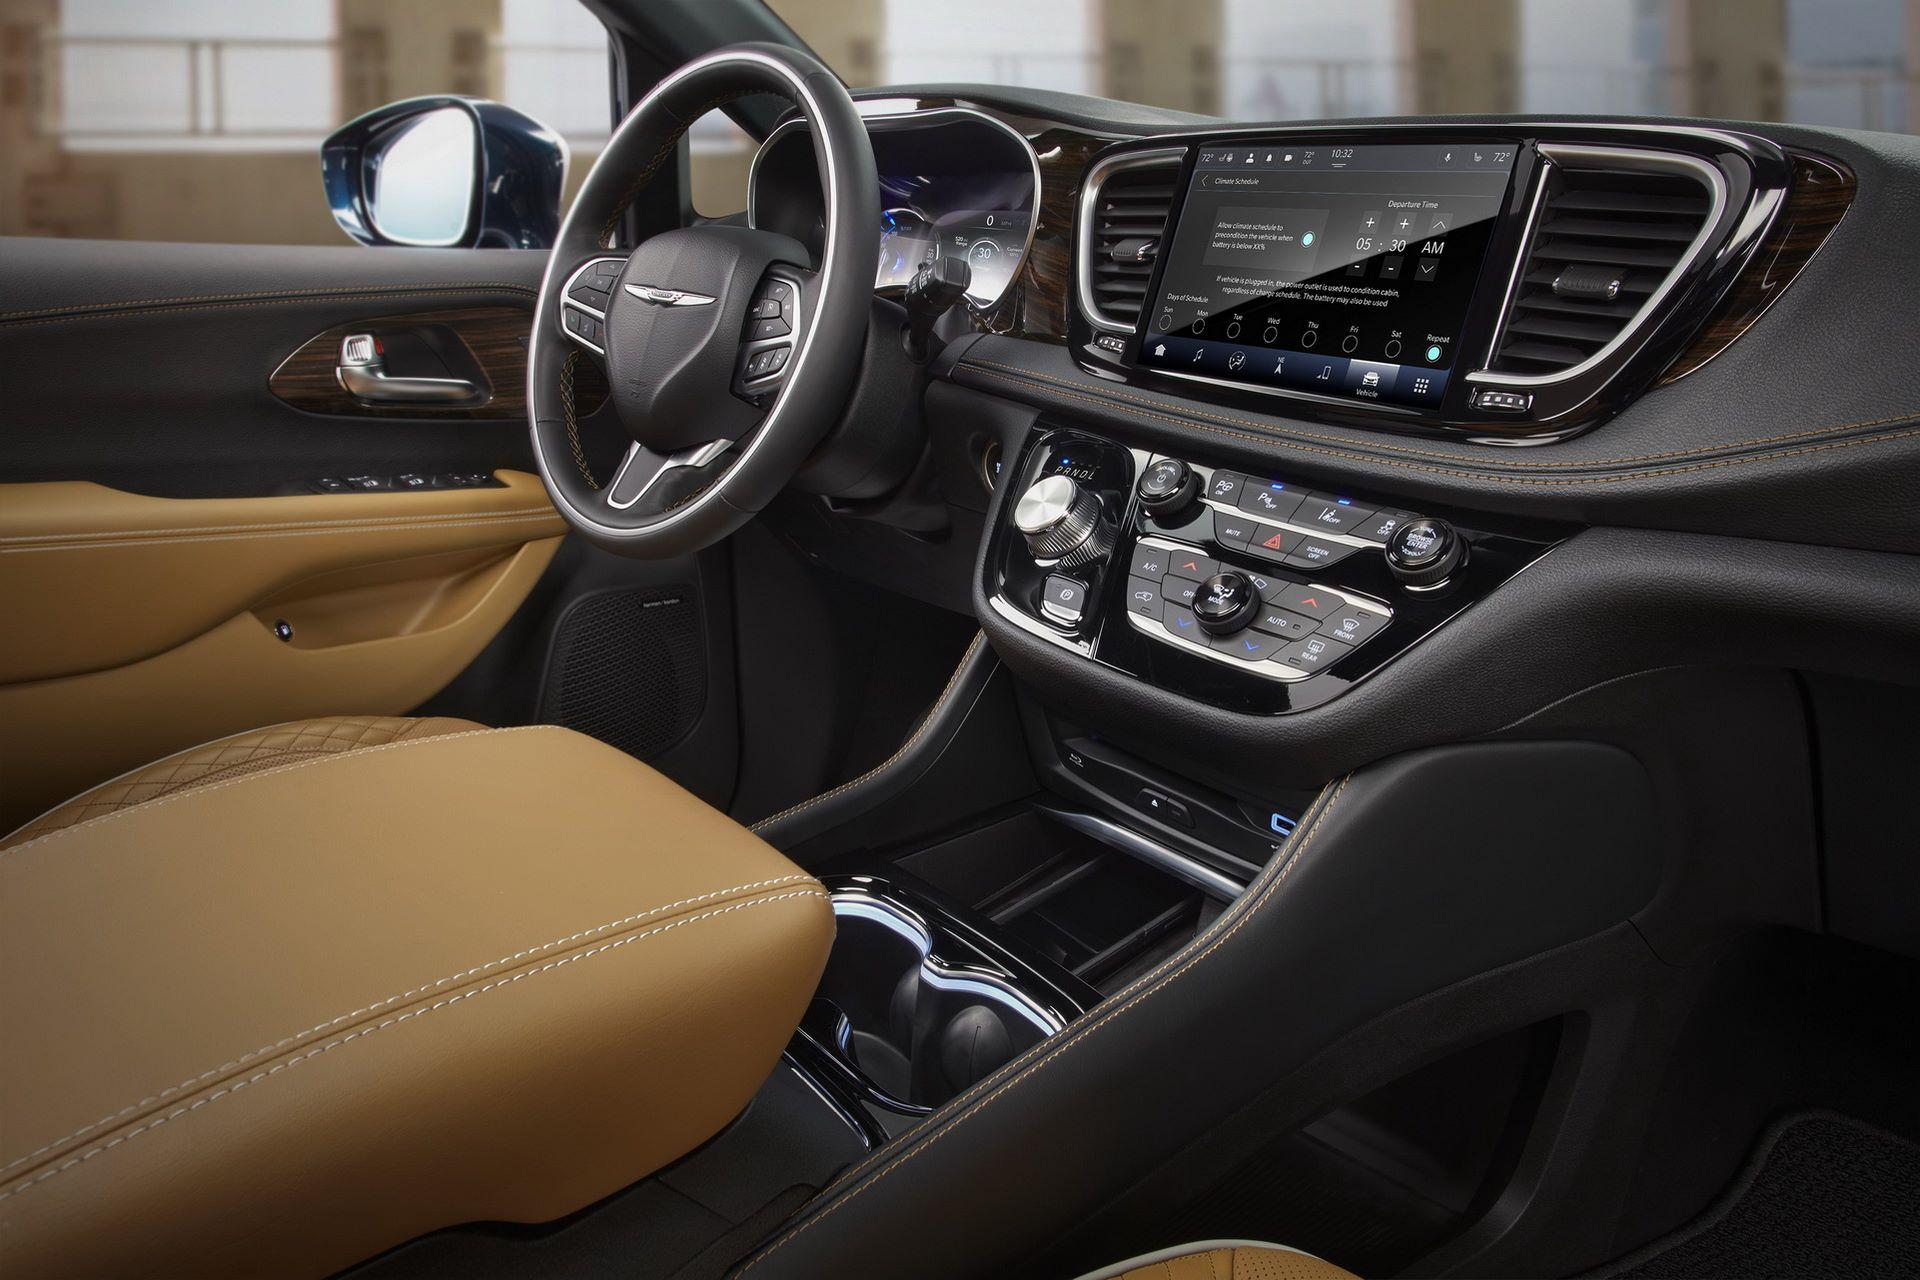 2021-Chrysler-Pacifica-80